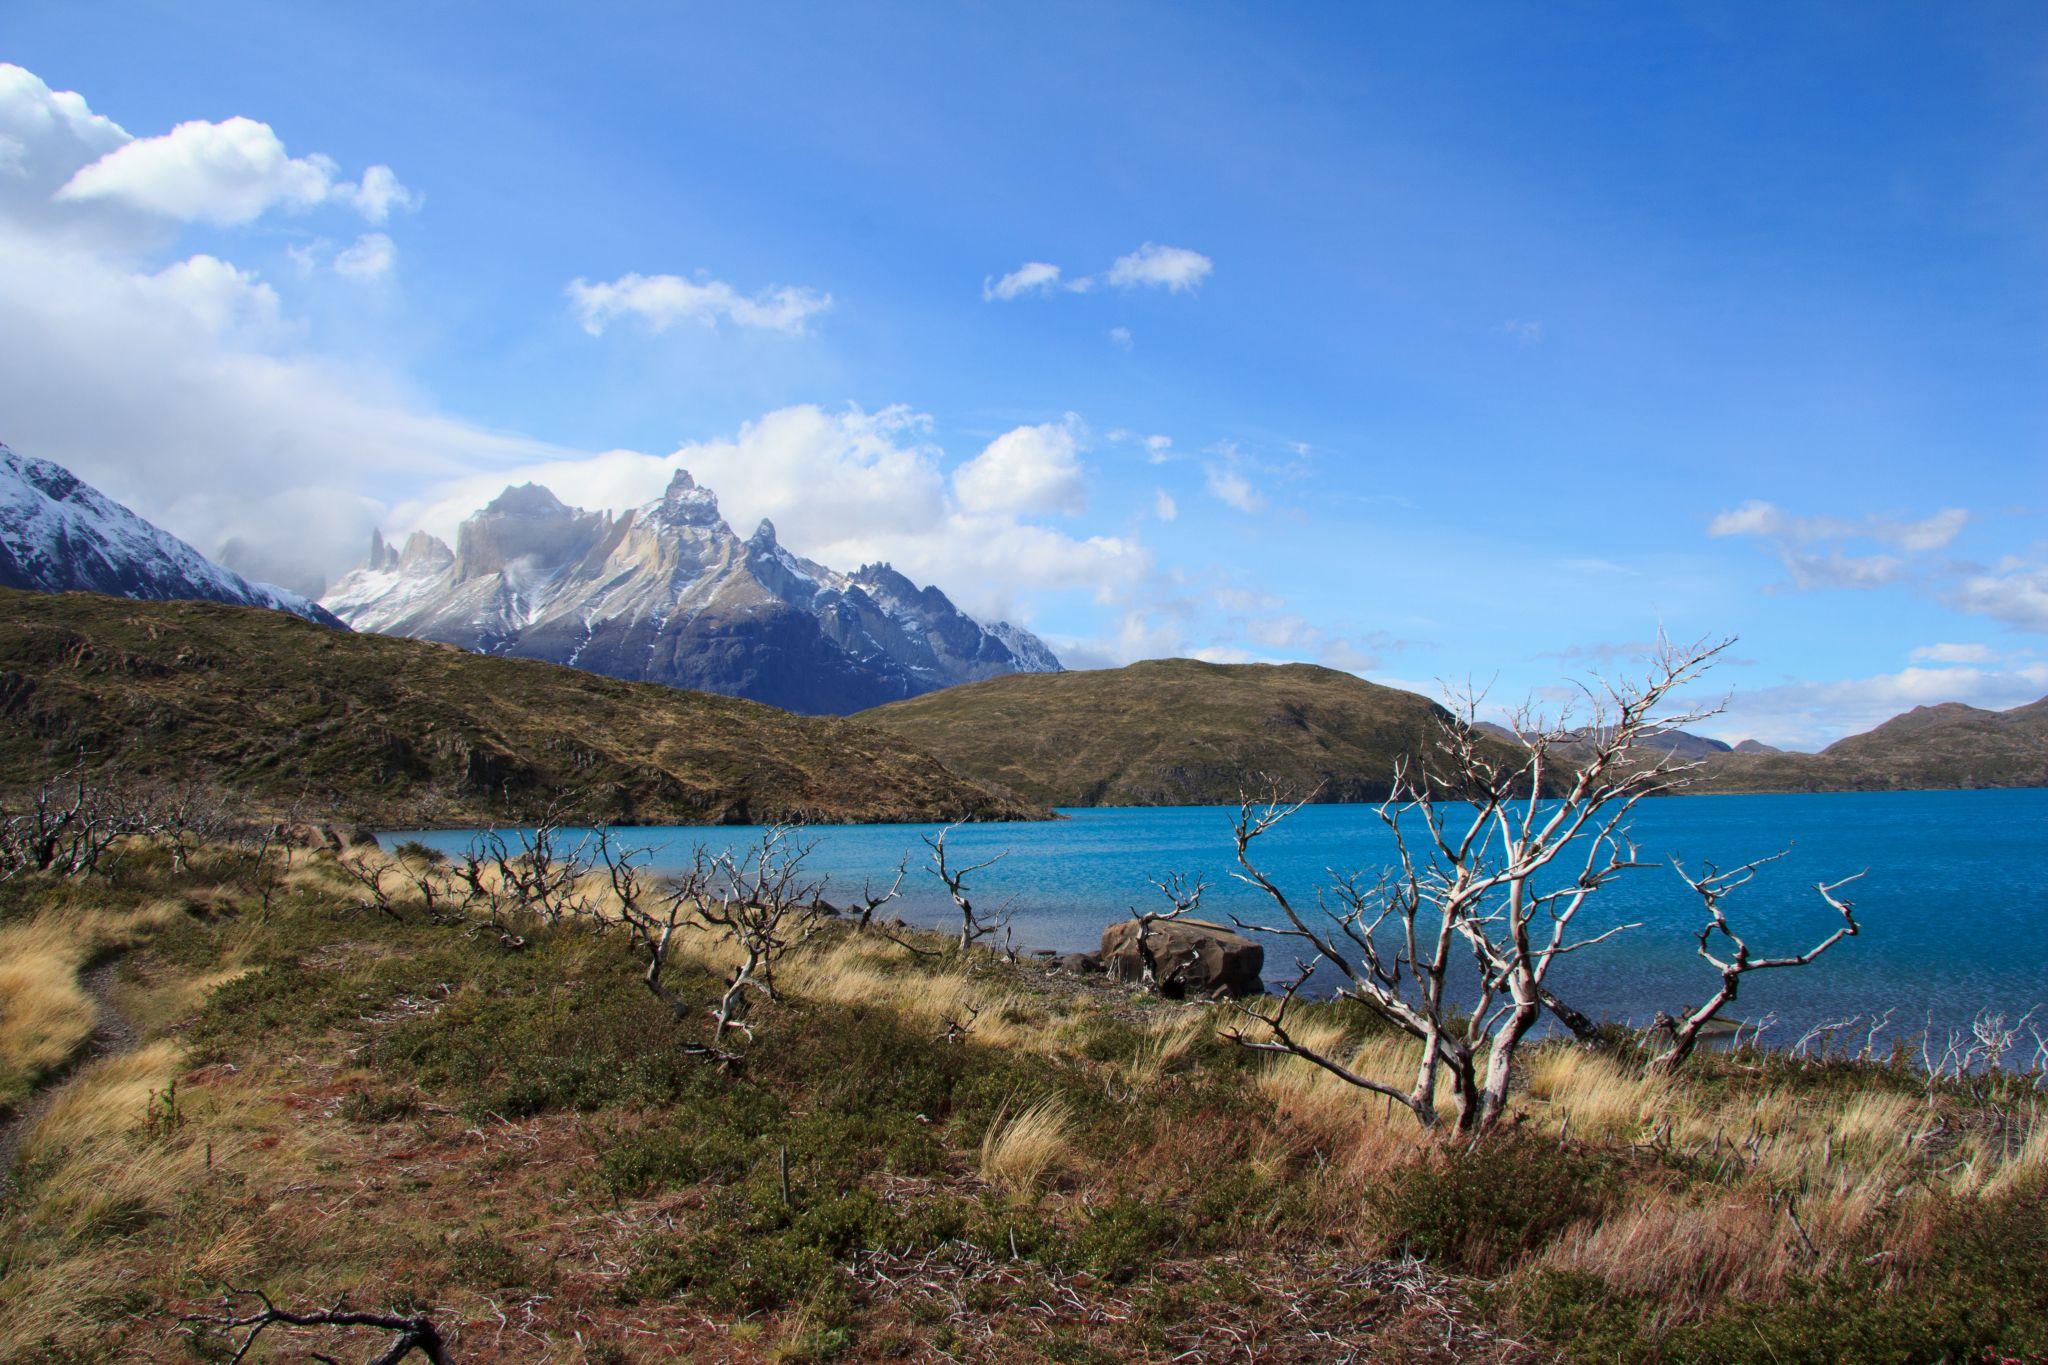 Lago Pehoé (Cuernos view), Chile